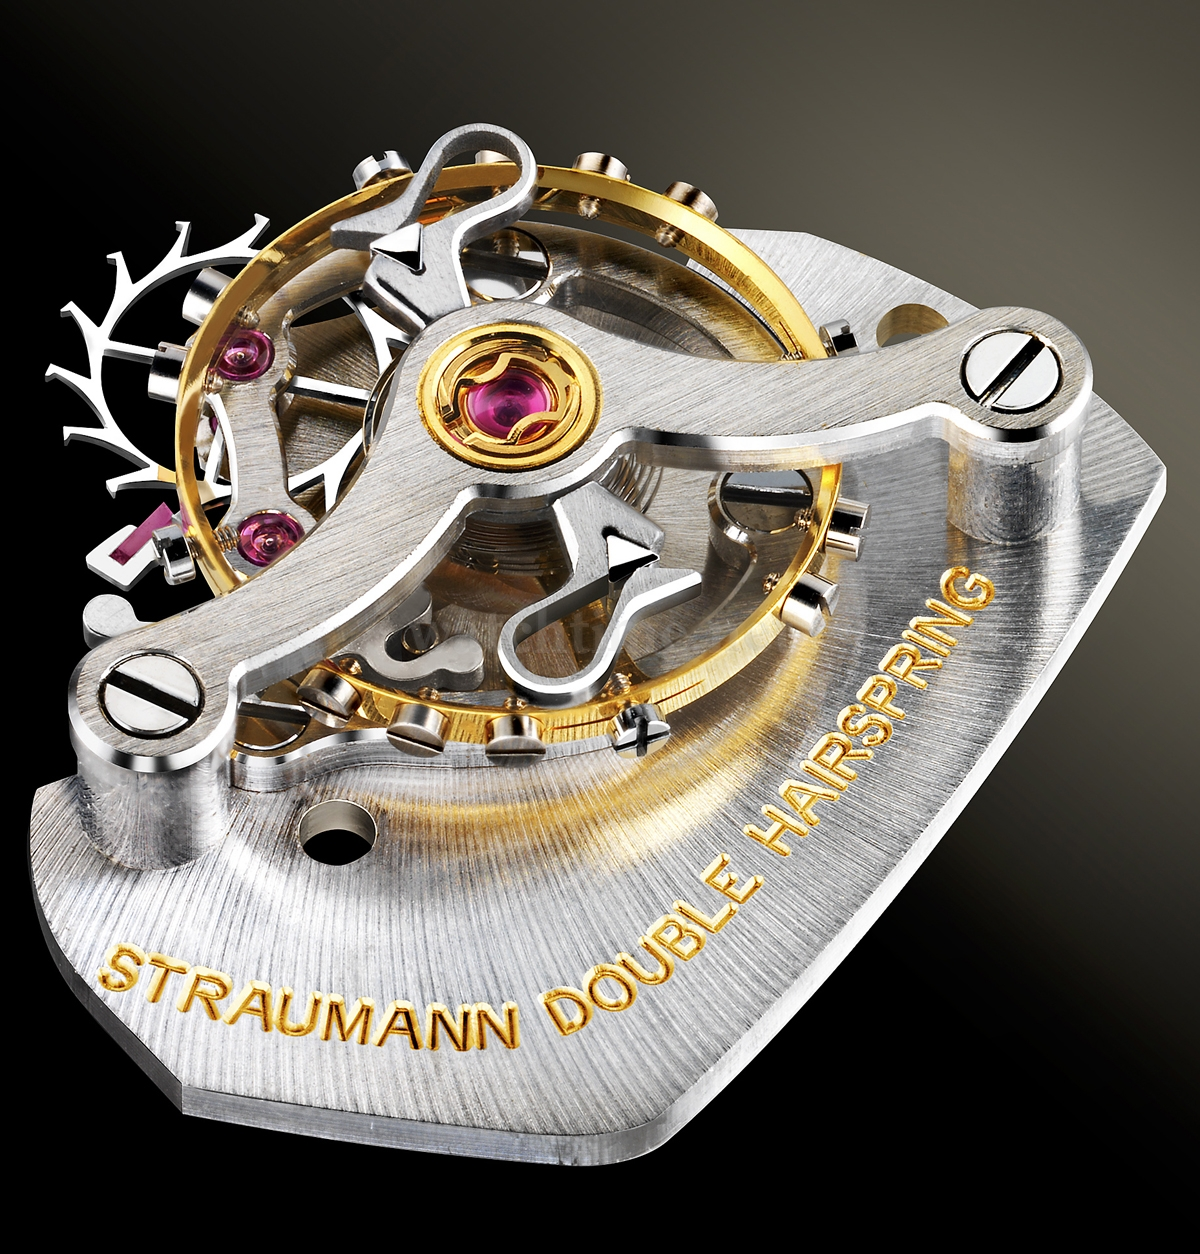 straumann-double-hairspring_web1